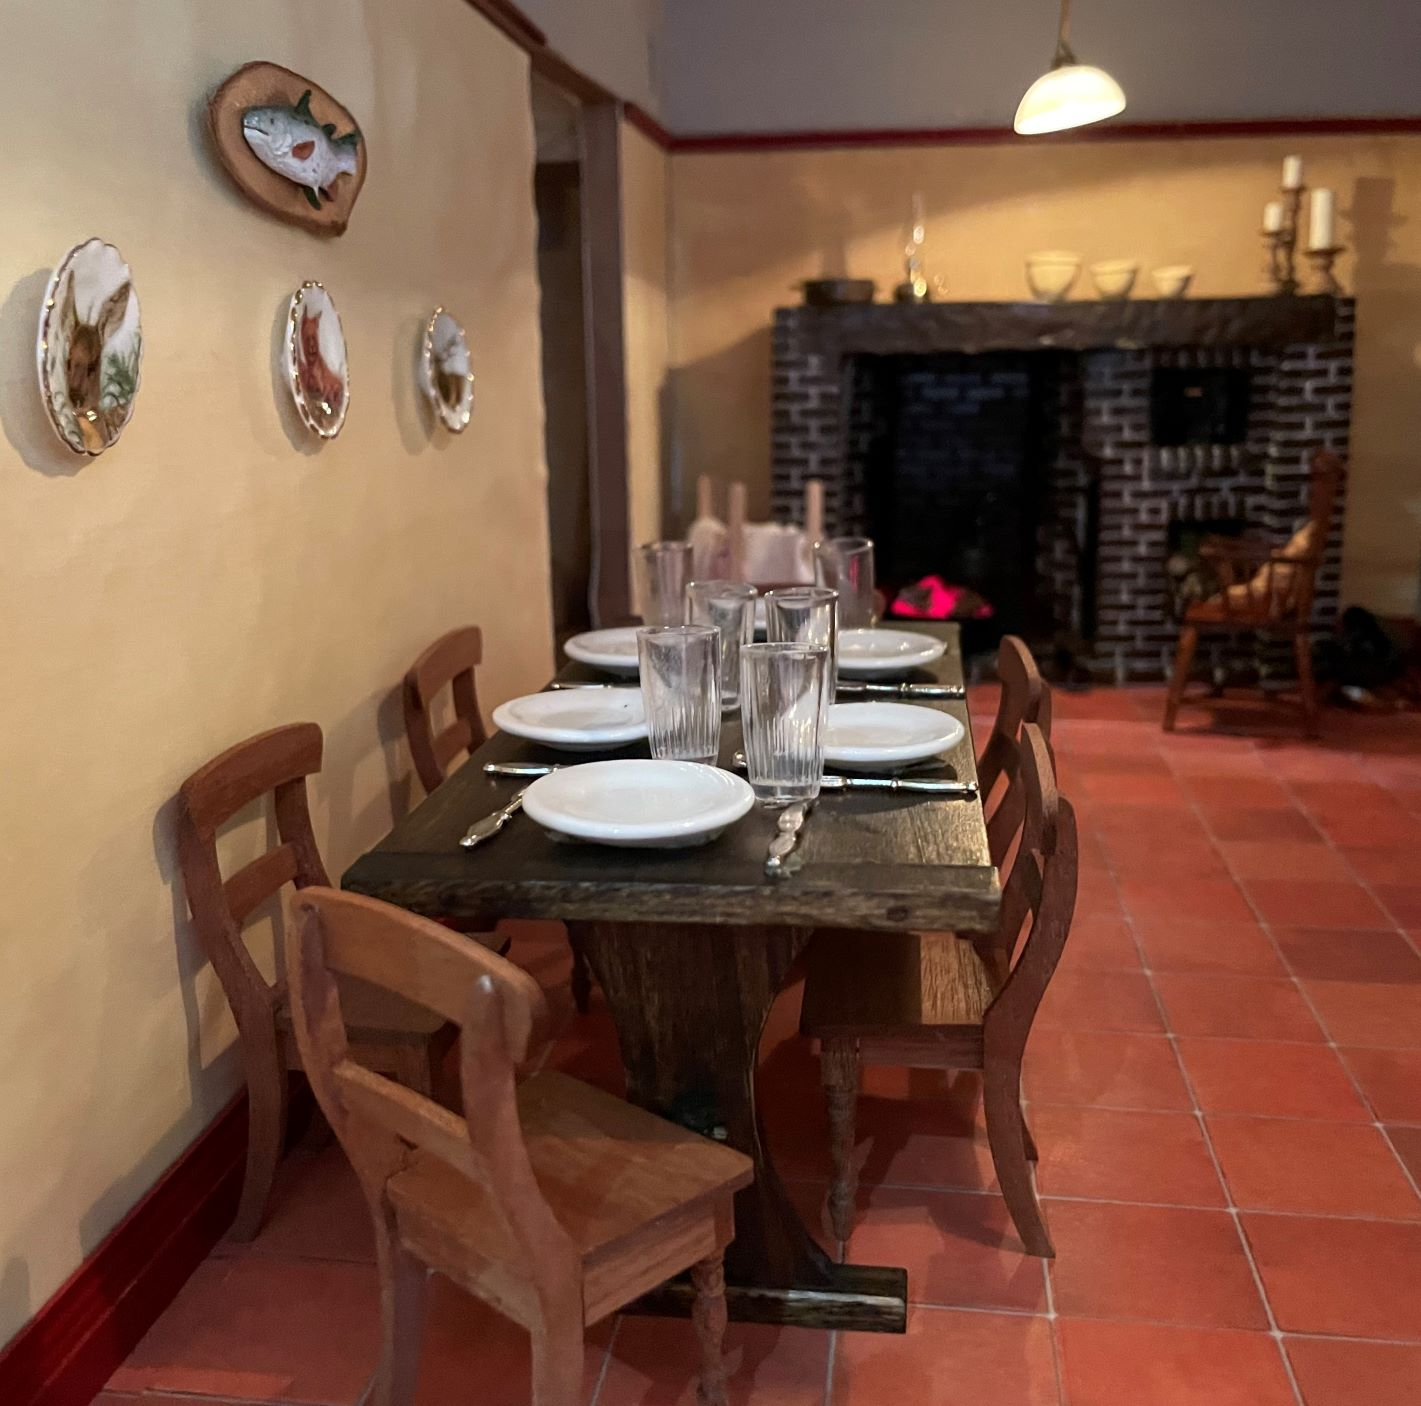 Servants' Dining Area